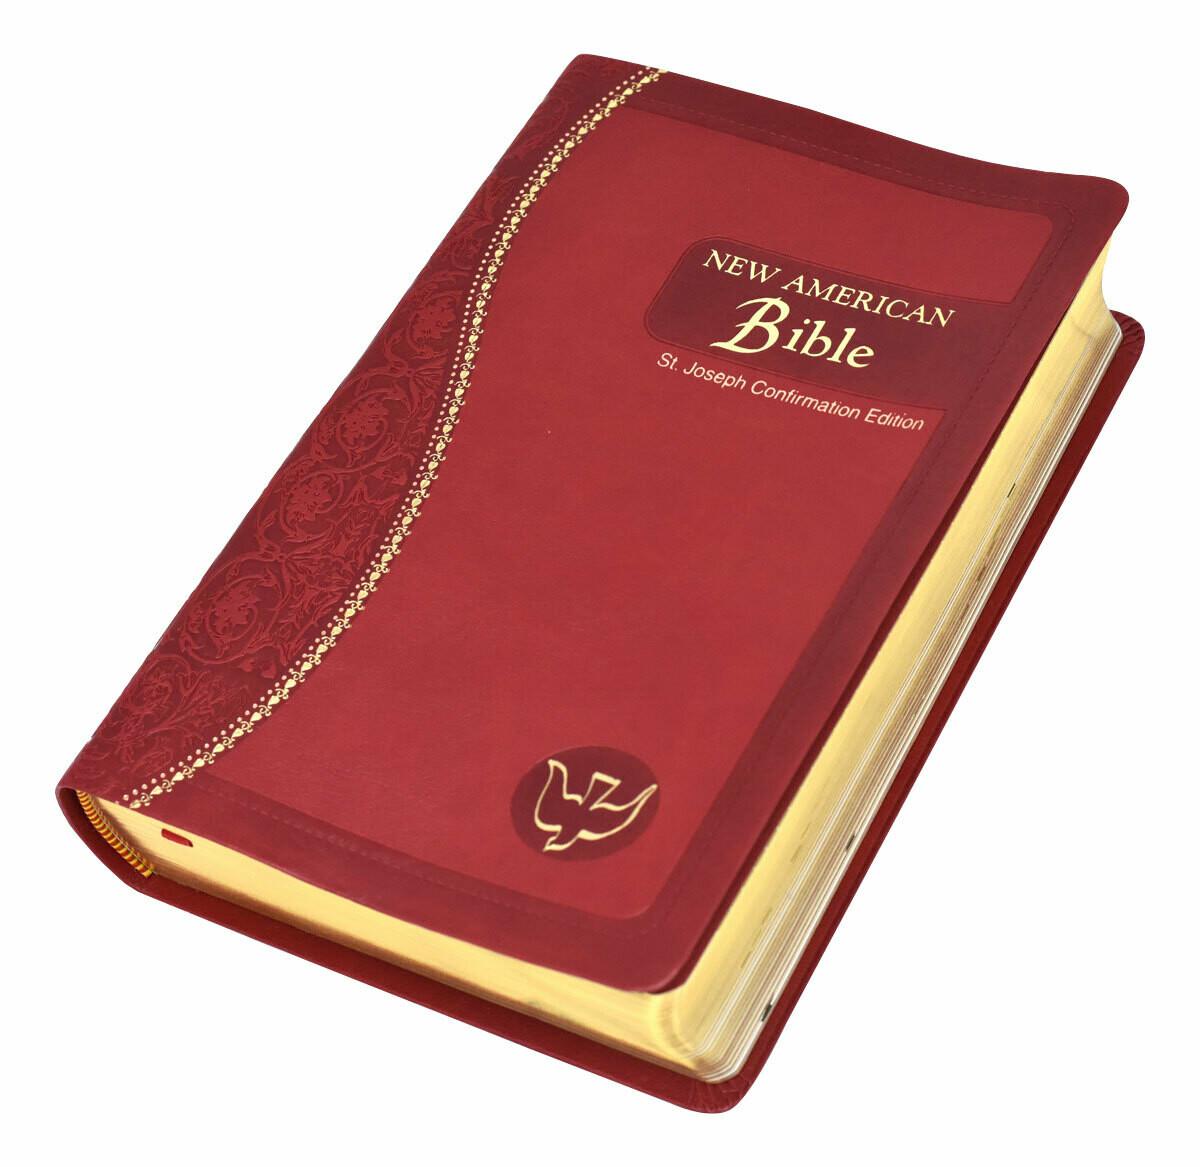 St Joseph Bible NABRE Confirmation Edition 609/19c